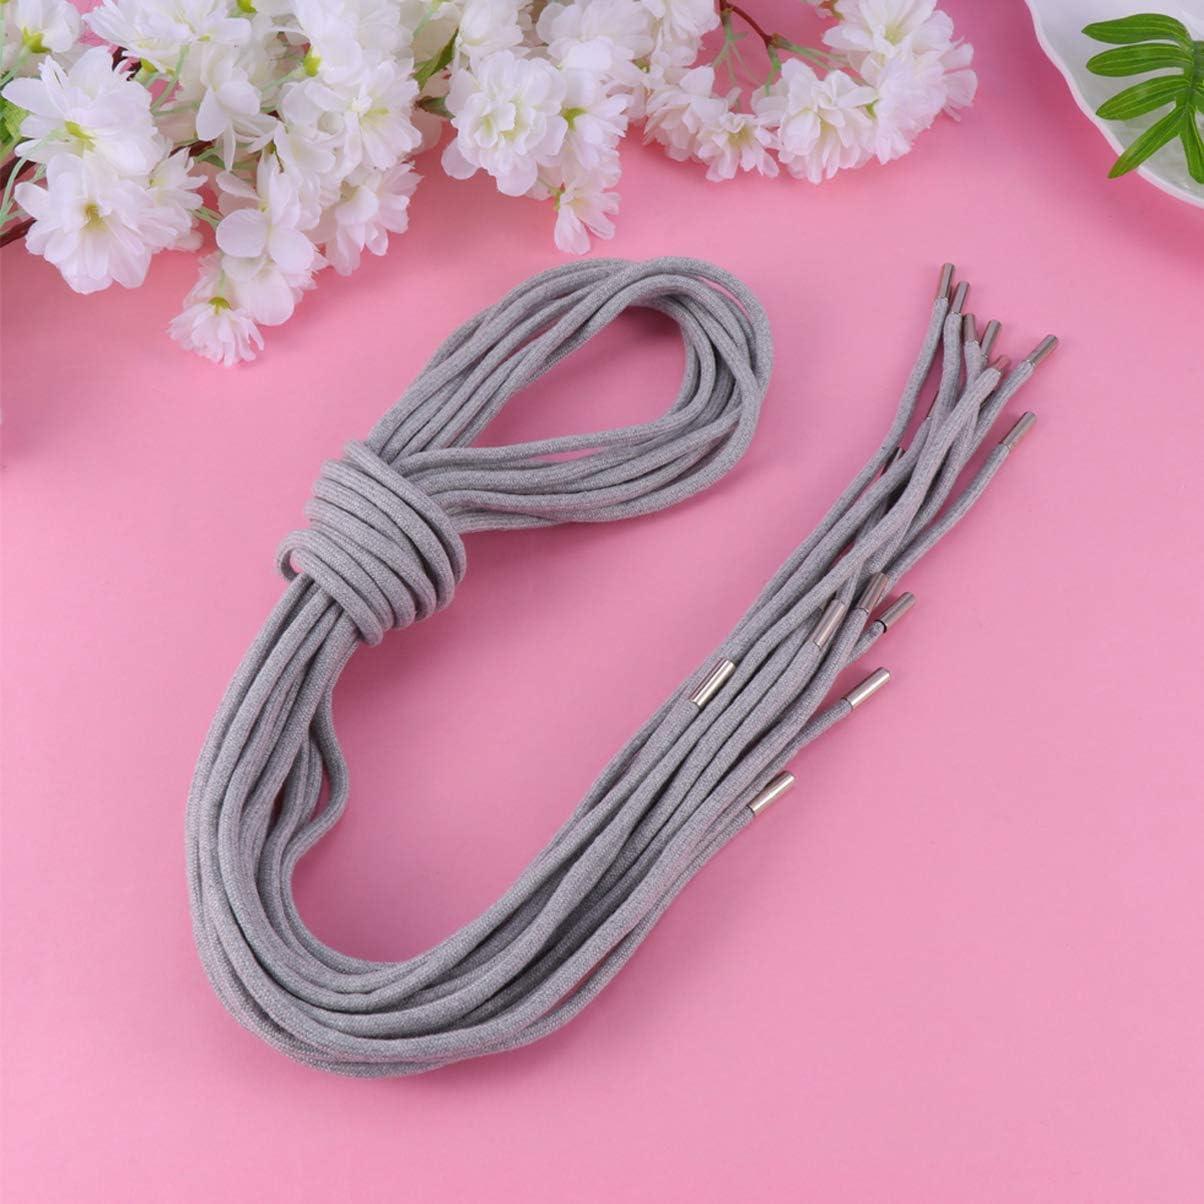 2 Pieces Nylon Drawstring Cord 130cm Shoelace Sweatpants Shorts String Black